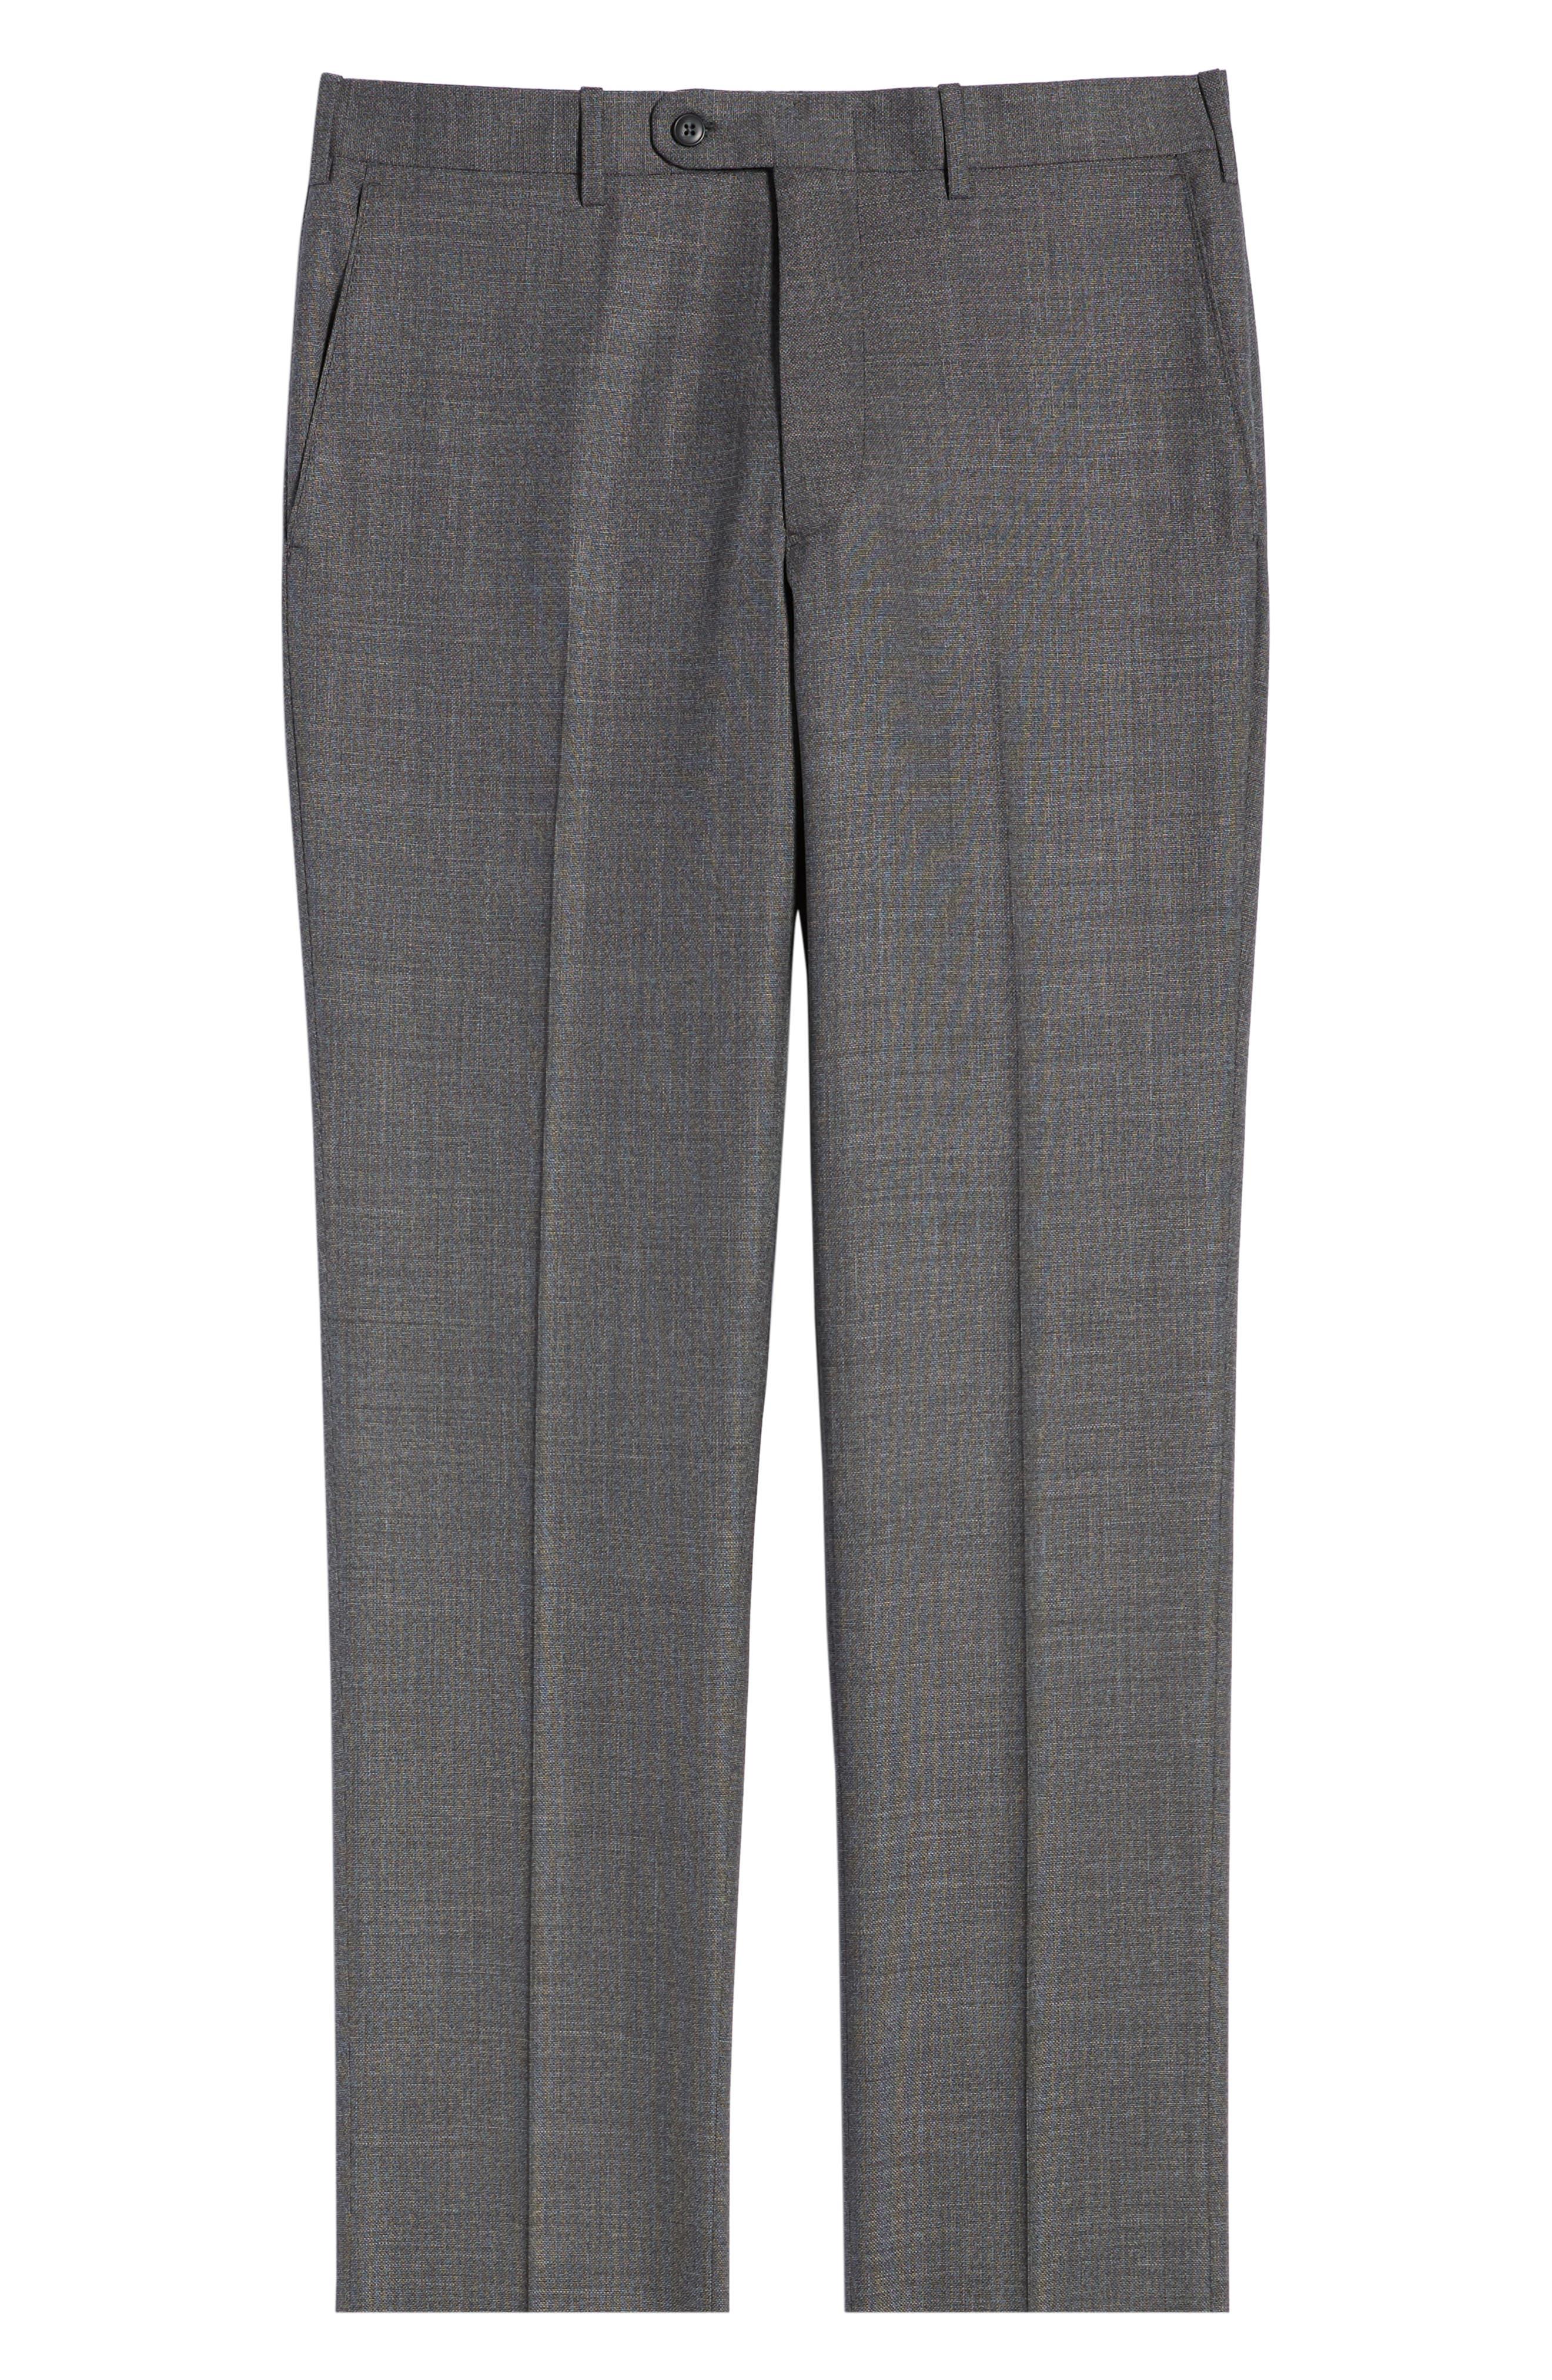 JOHN W. NORDSTROM<SUP>®</SUP>, Torino Flat Front Solid Wool Trousers, Alternate thumbnail 6, color, GREY PHANTOM BASKET WEAVE